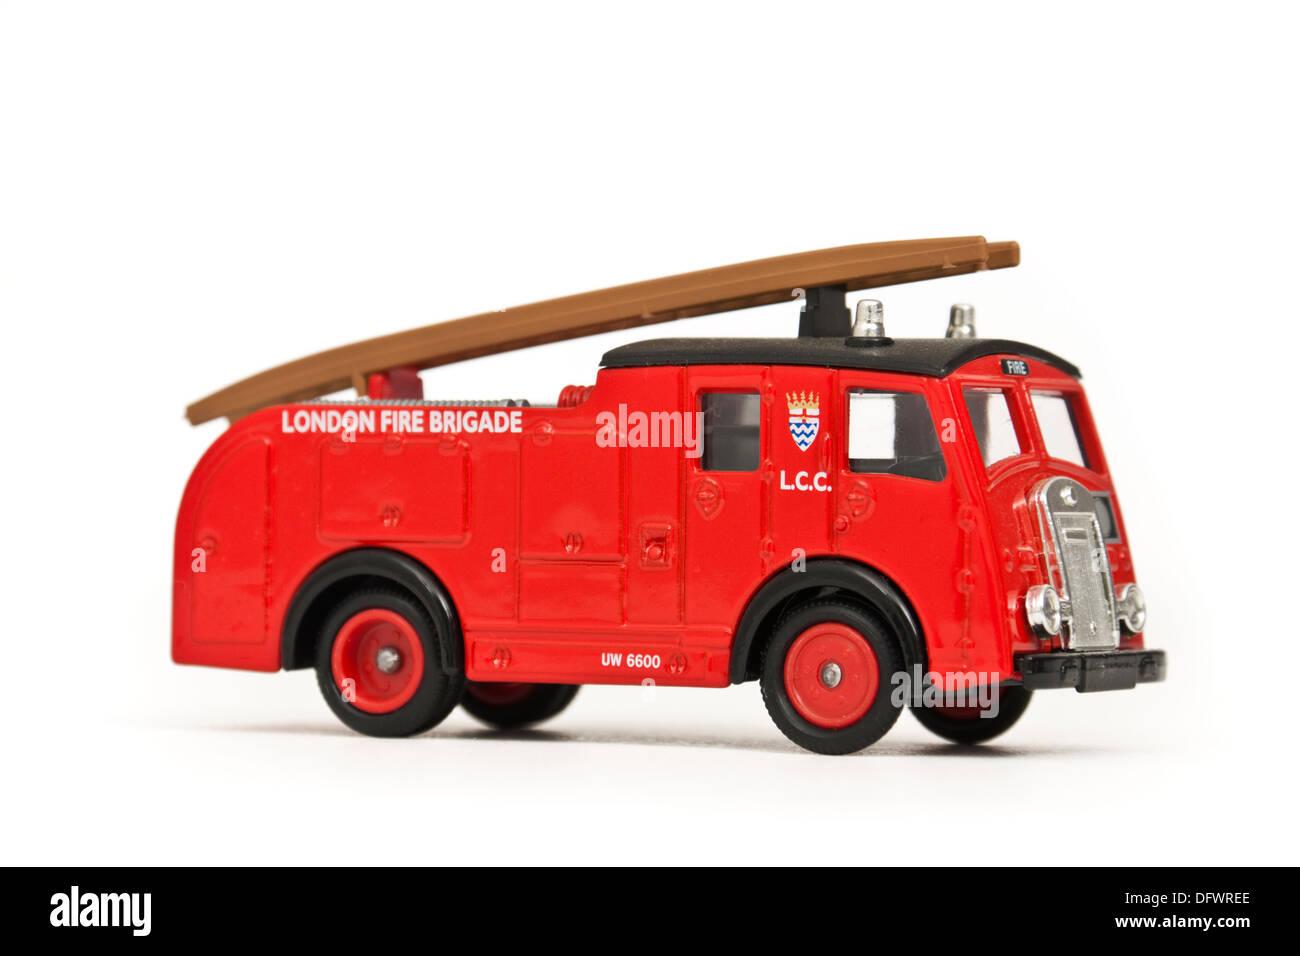 London Fire Brigade engine replica / diecast model toy - Stock Image